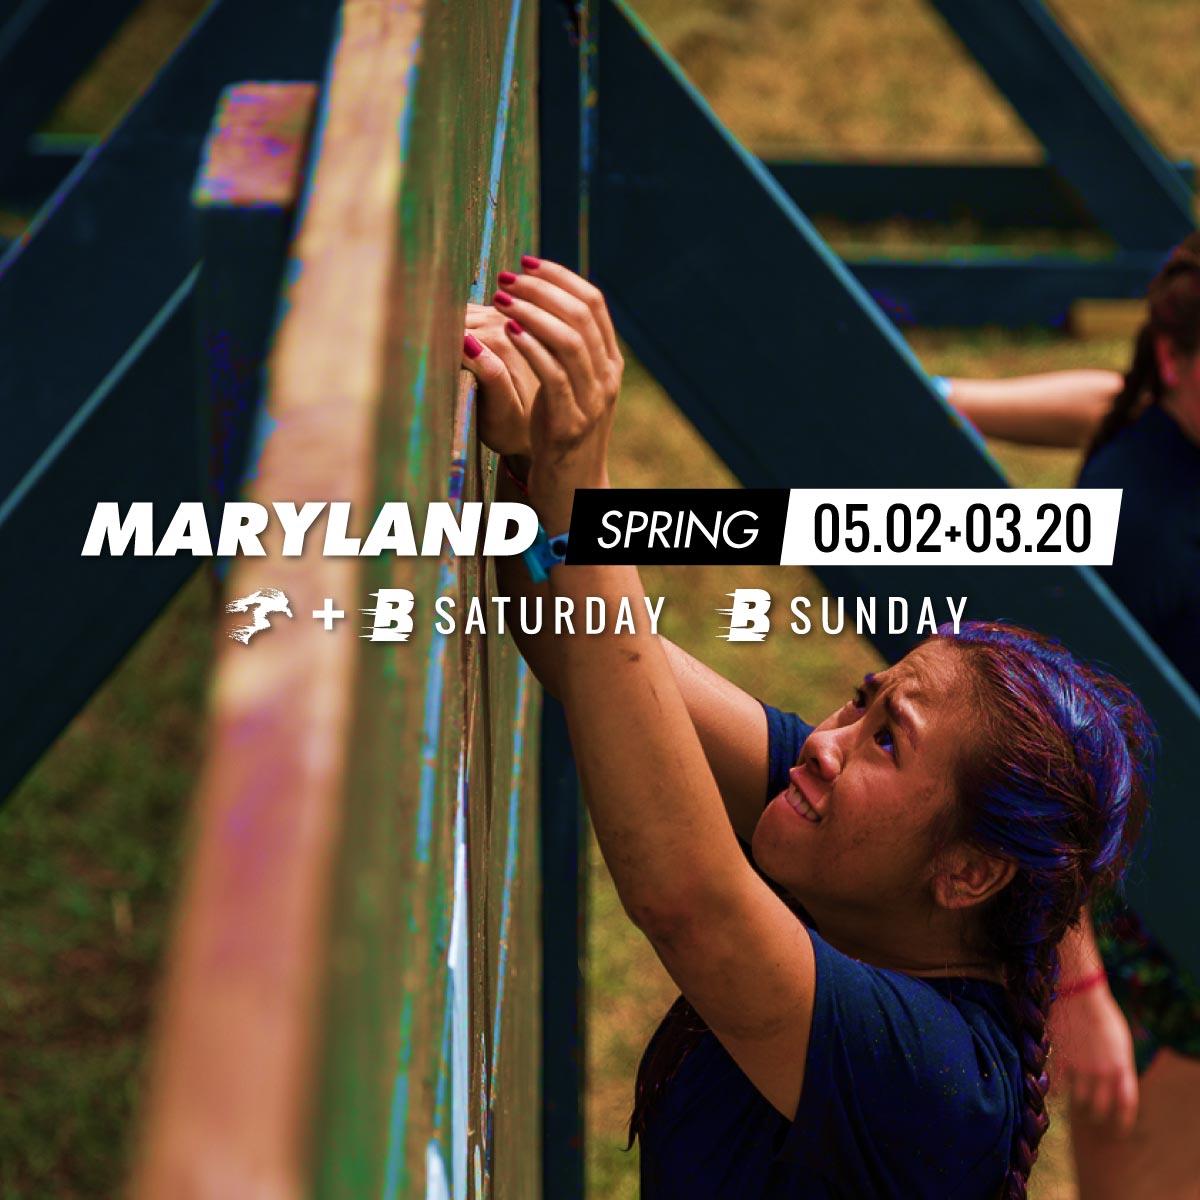 Savage Race Maryland Spring 2020